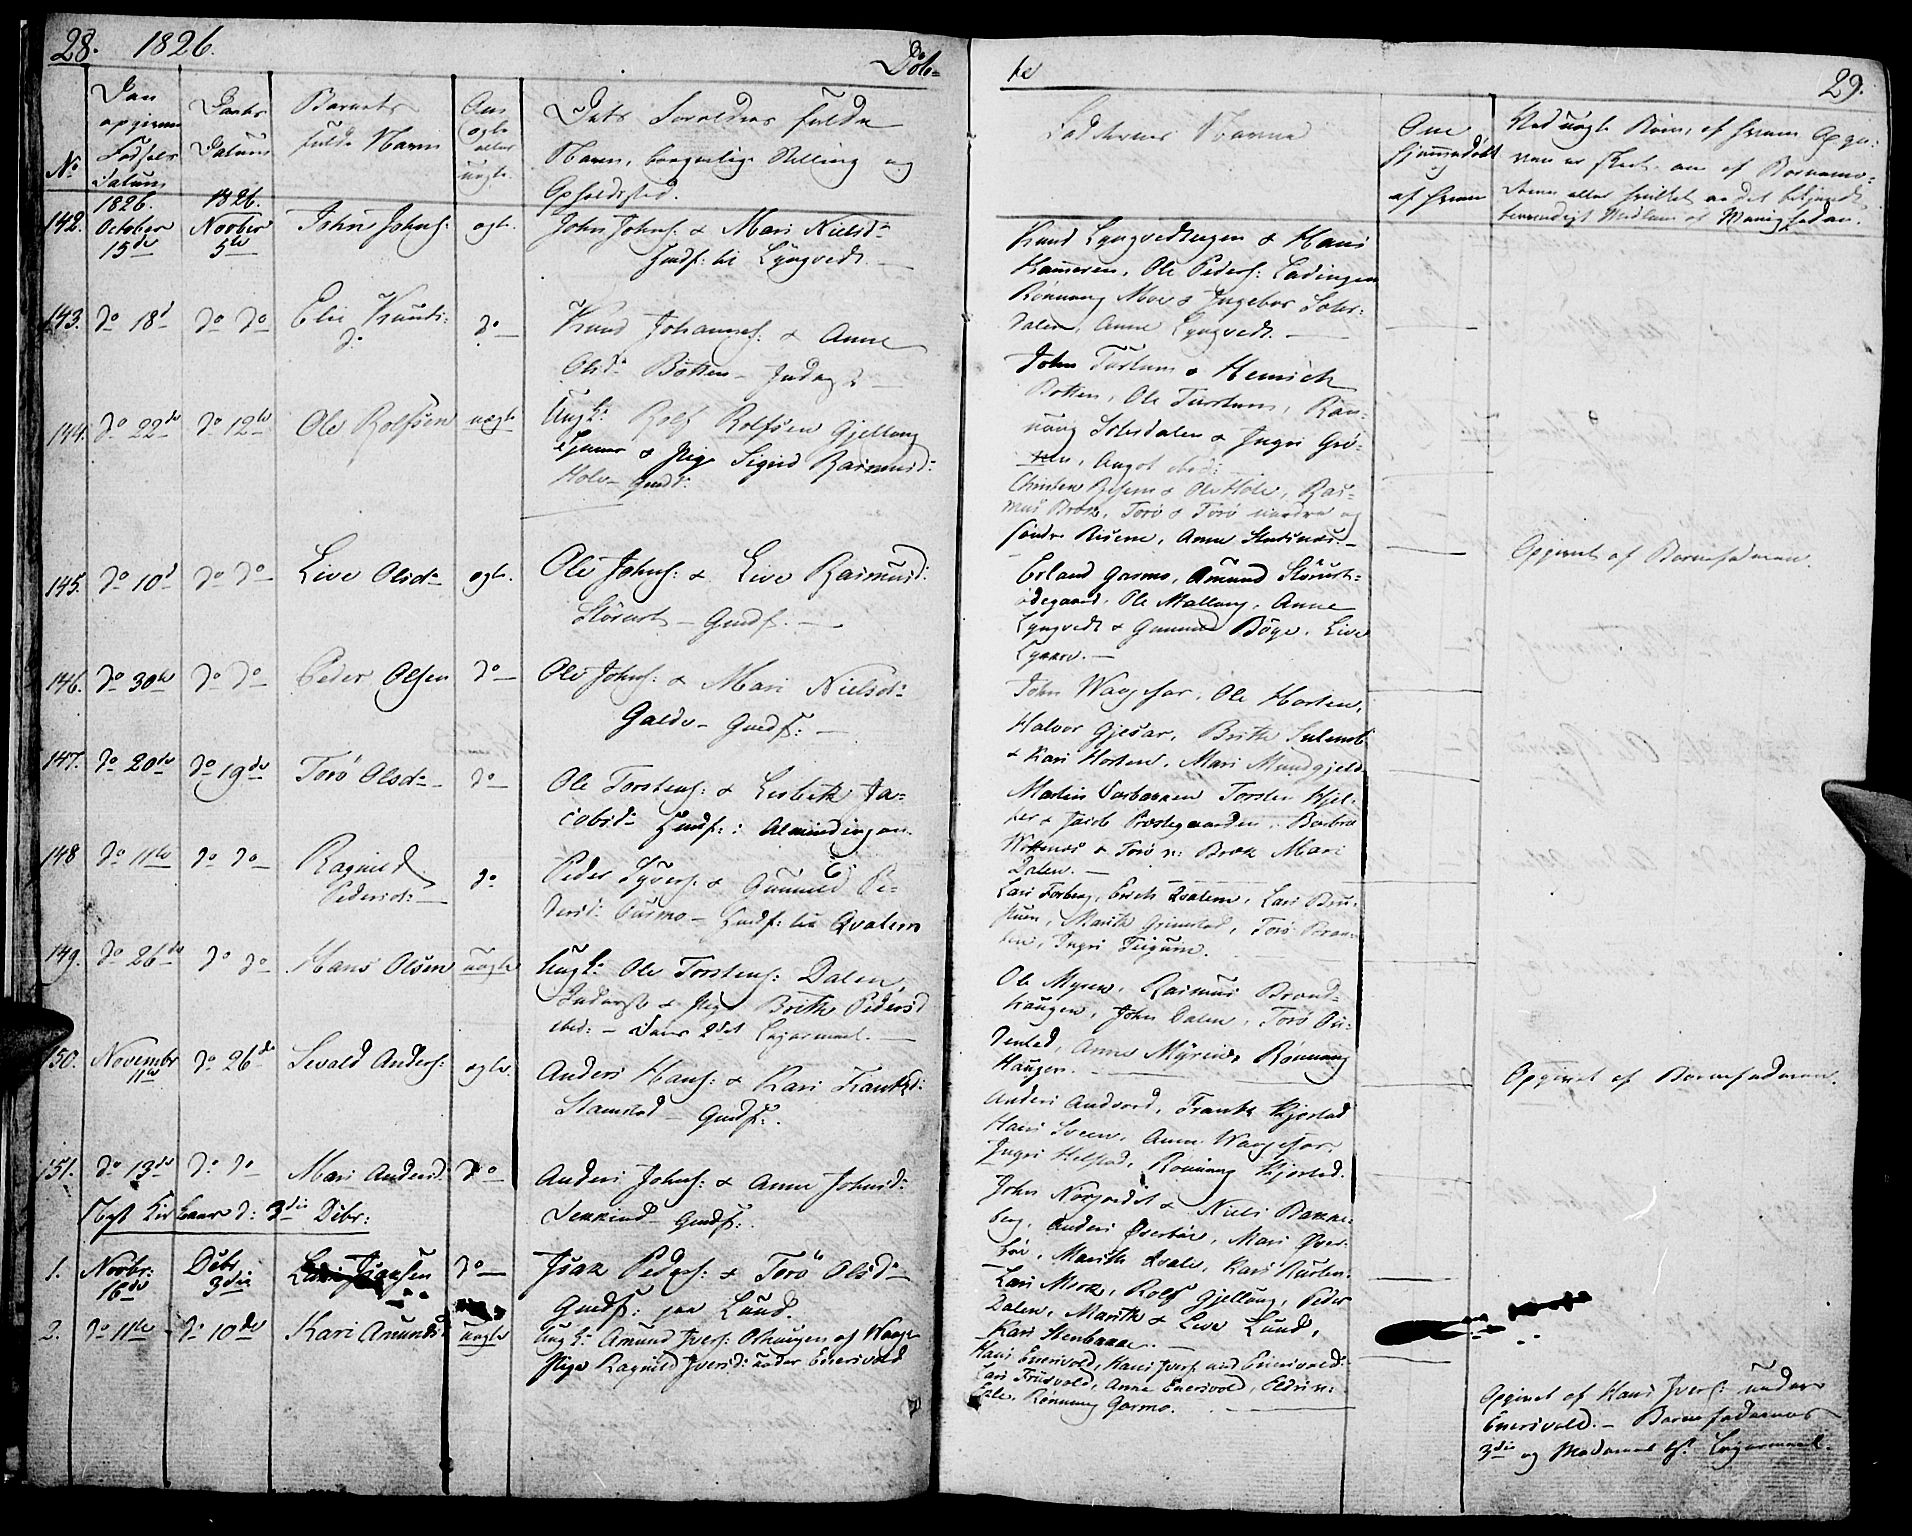 SAH, Lom prestekontor, K/L0005: Parish register (official) no. 5, 1825-1837, p. 28-29